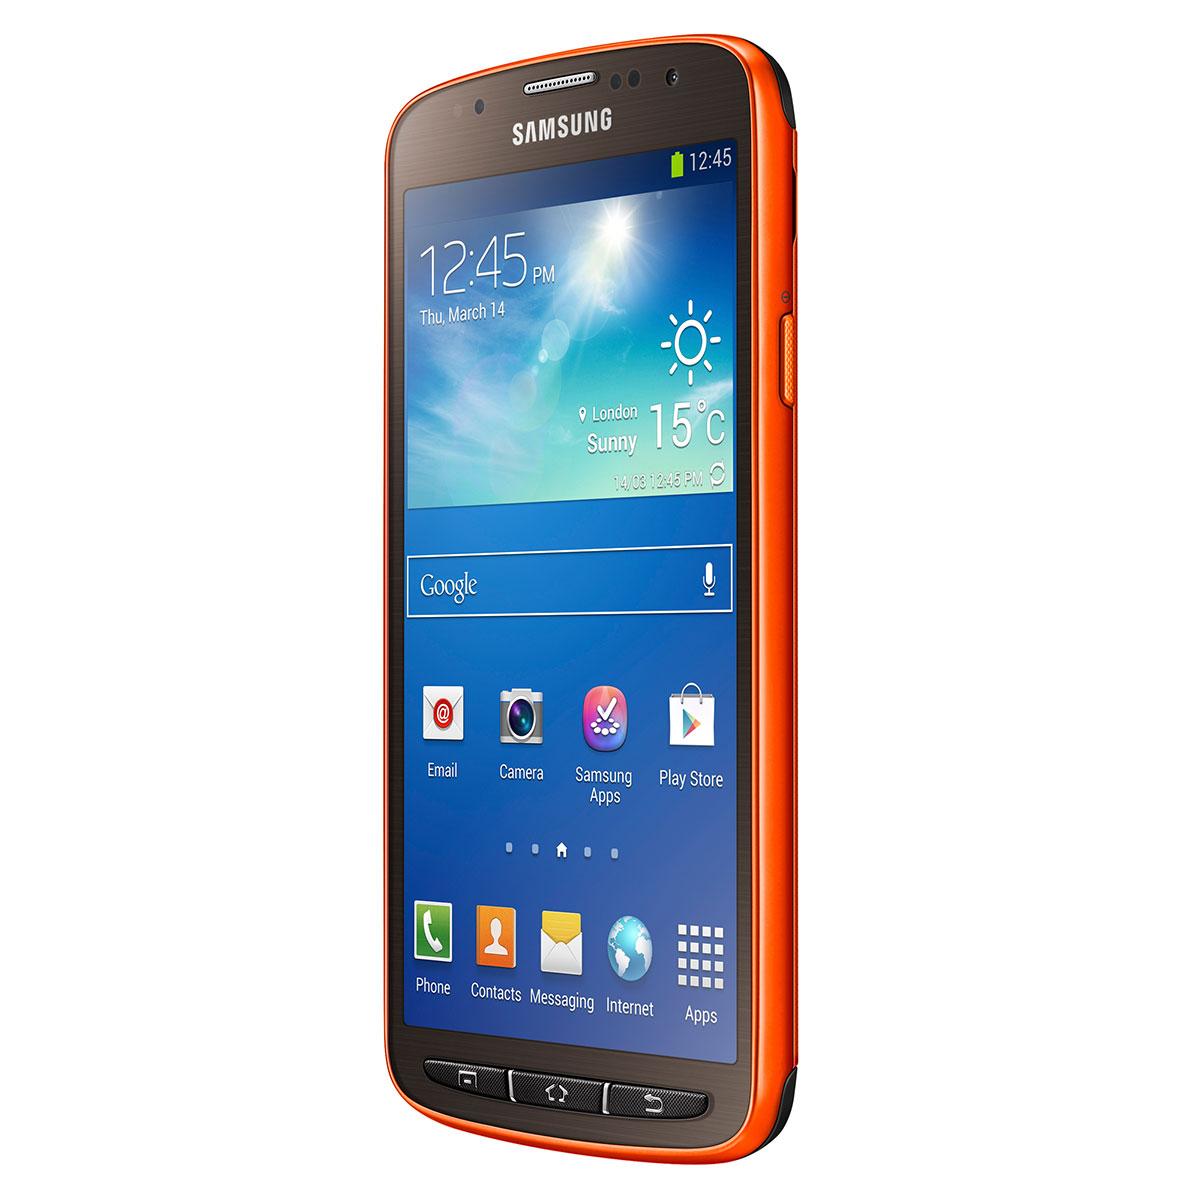 Samsung galaxy s4 active 16 go comparer avec - Comparateur de prix samsung galaxy s4 ...